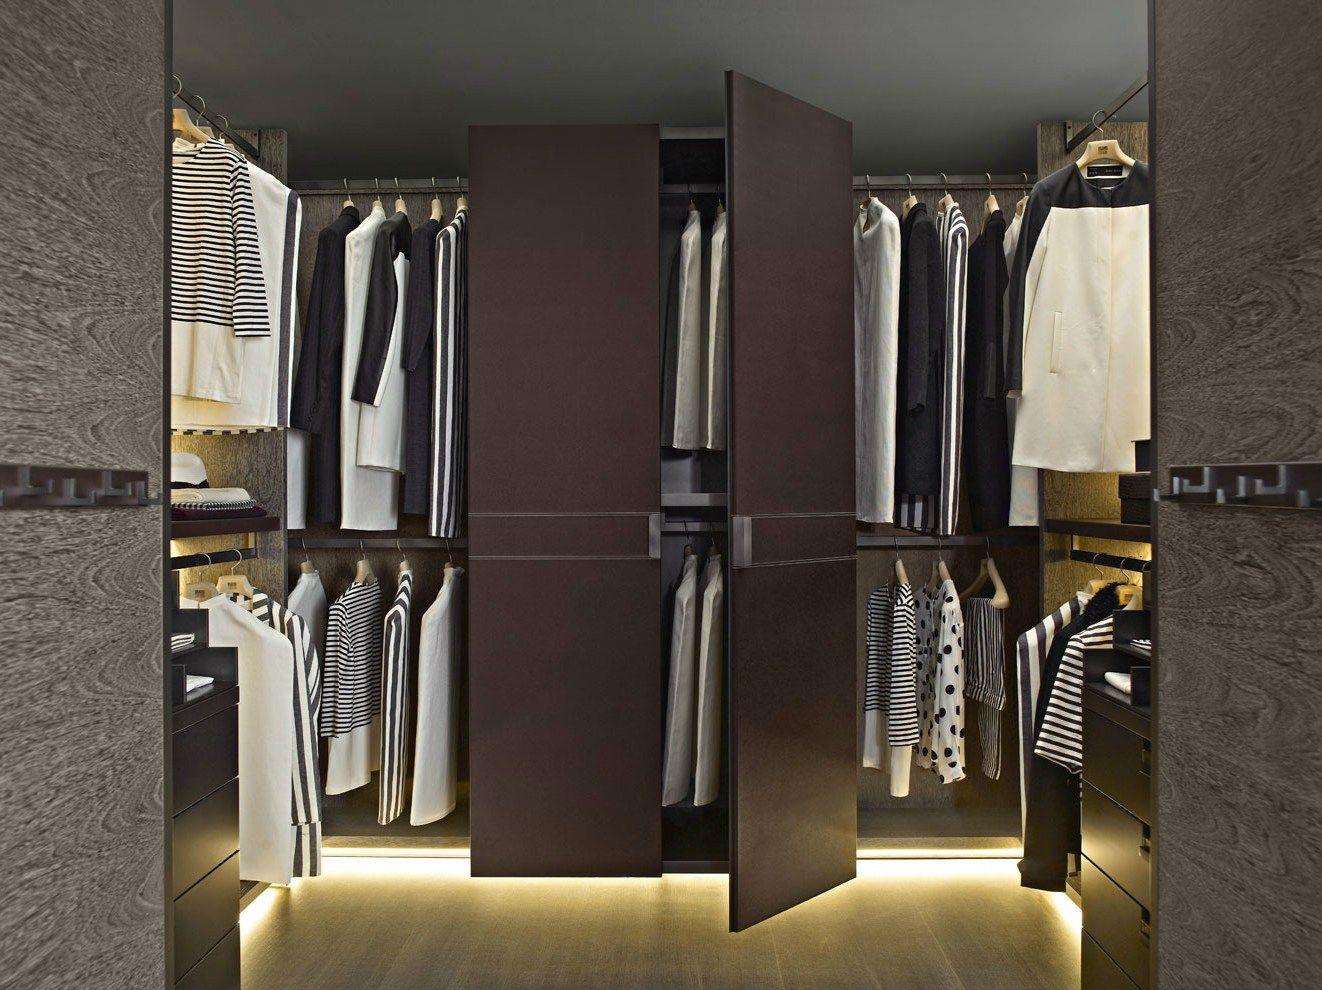 Walkin wardrobe BACKSTAGE Backstage Collection by B B&b